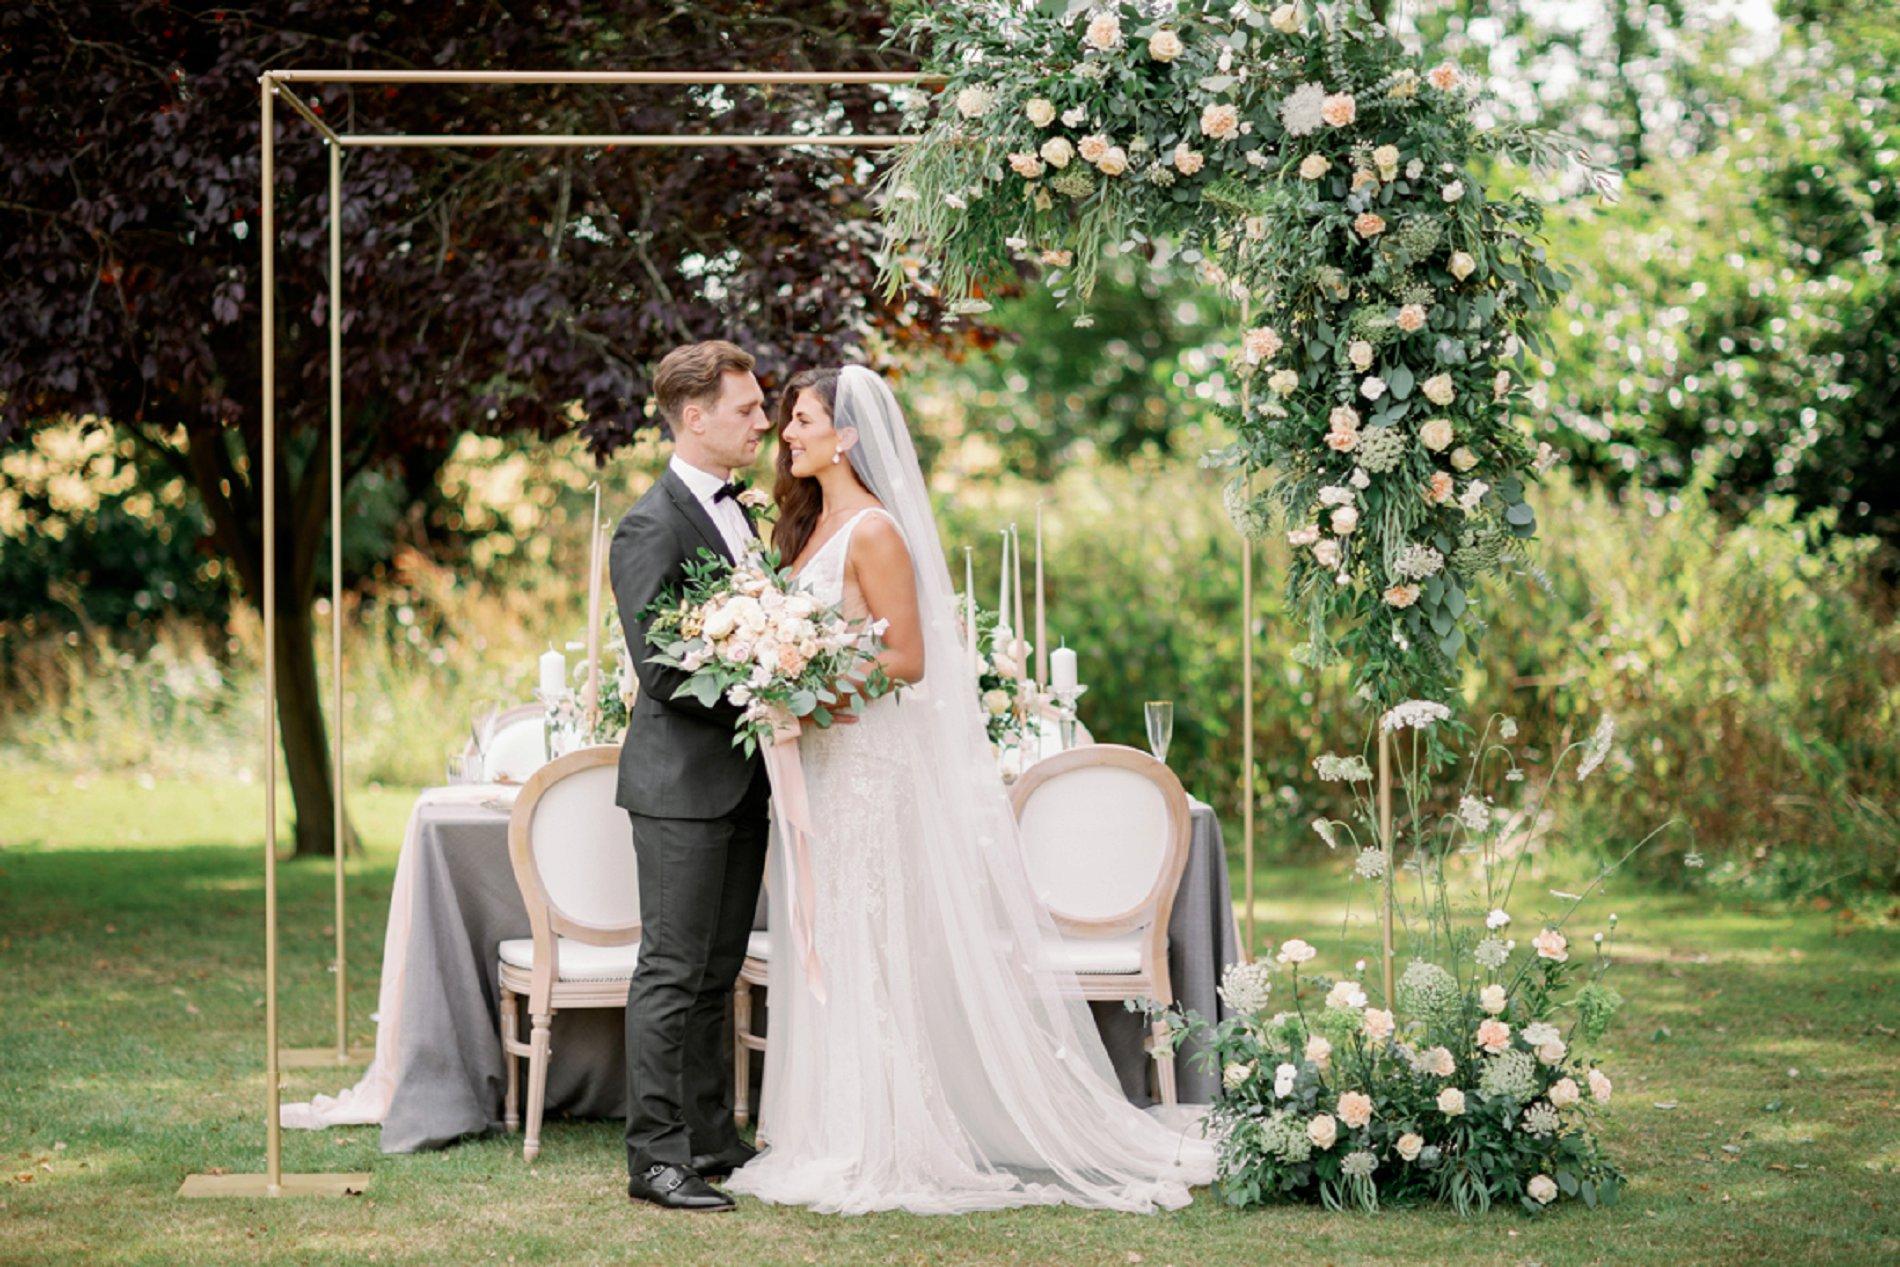 An Elegant Styled Shoot at Baddow Park House (c) Camilla J Hards (8)